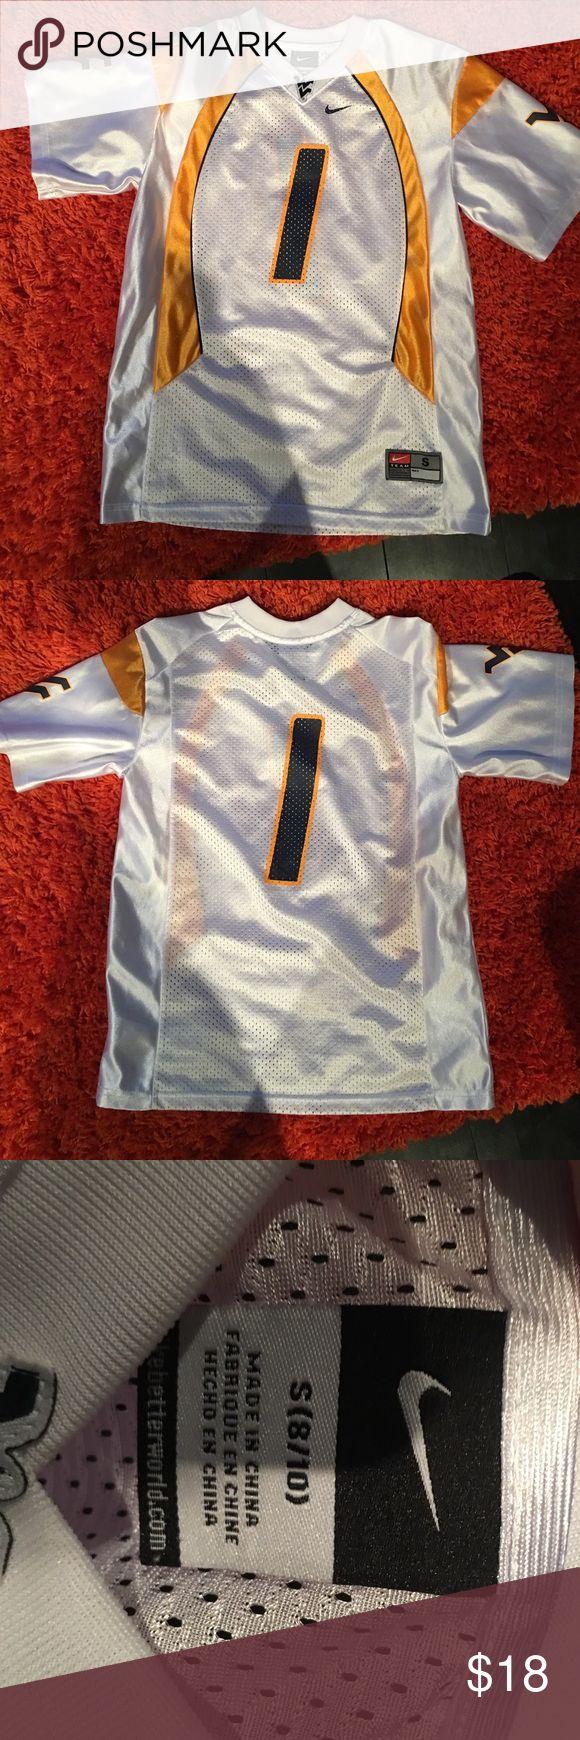 Nike mountaineers football jersey.  #1 Nike mountaineers football jersey #1.   Size 8/10 small great shape. Nike Shirts & Tops